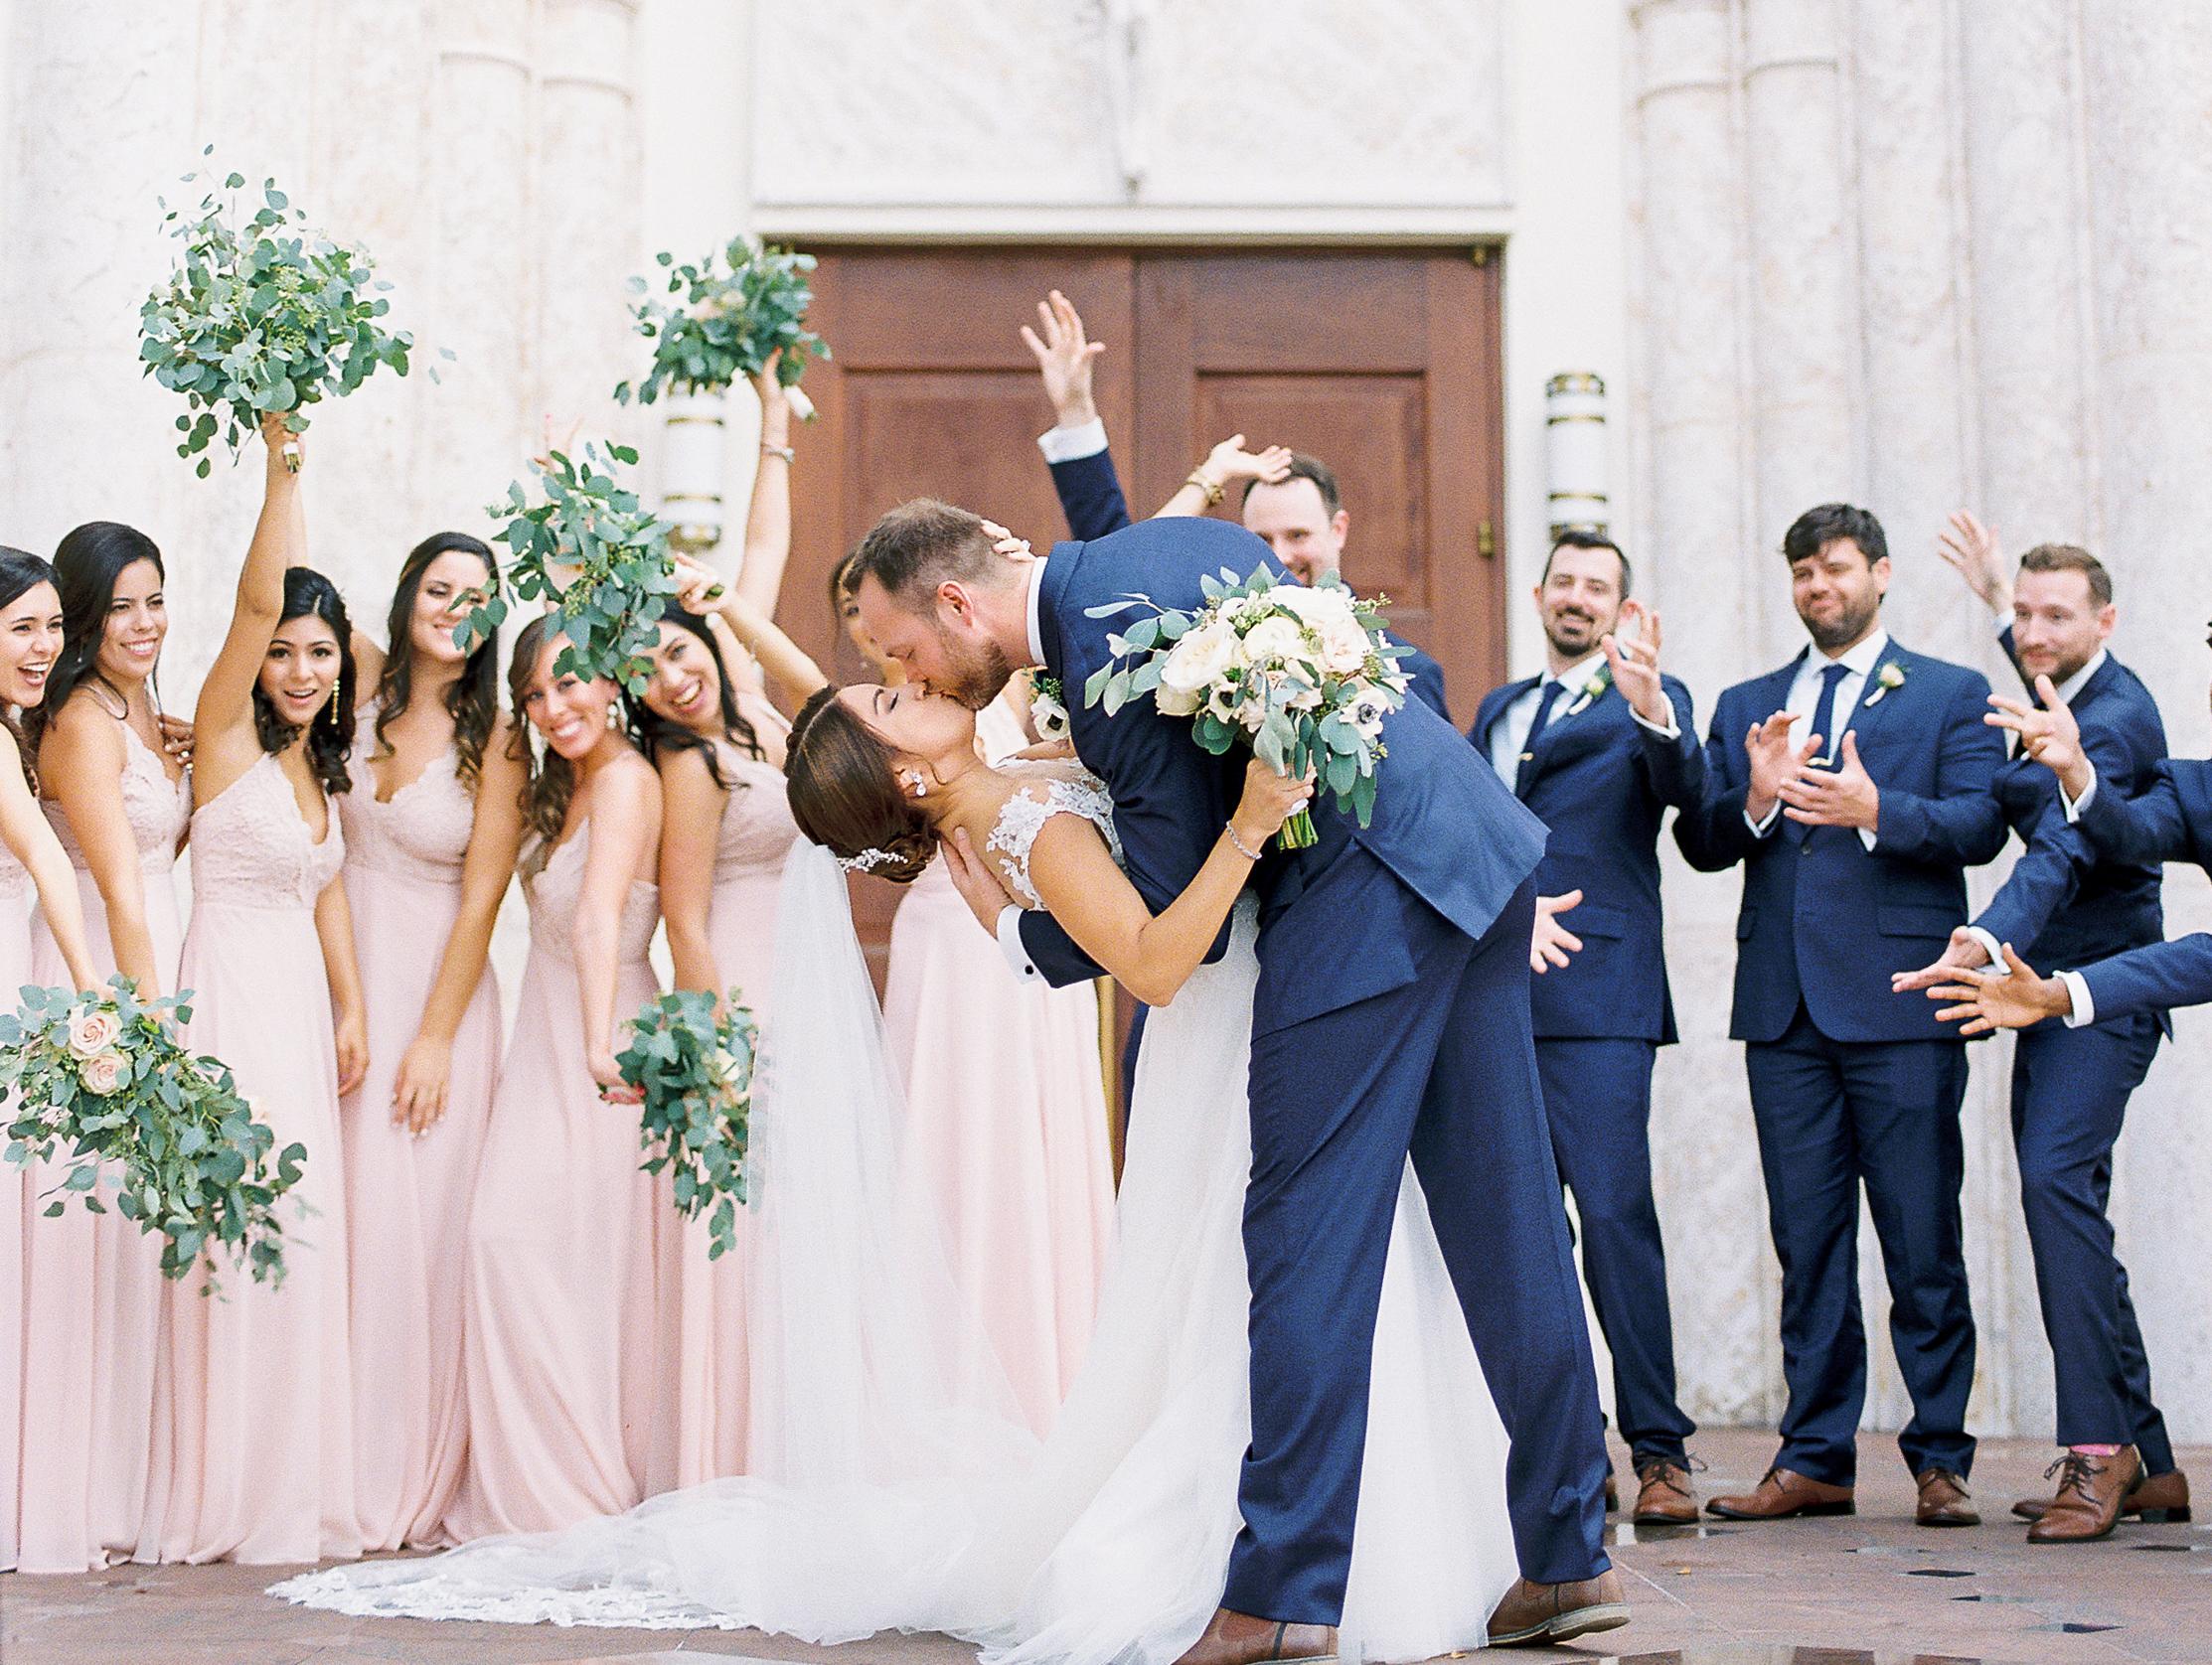 orlando-wedding-bridal-party-photo